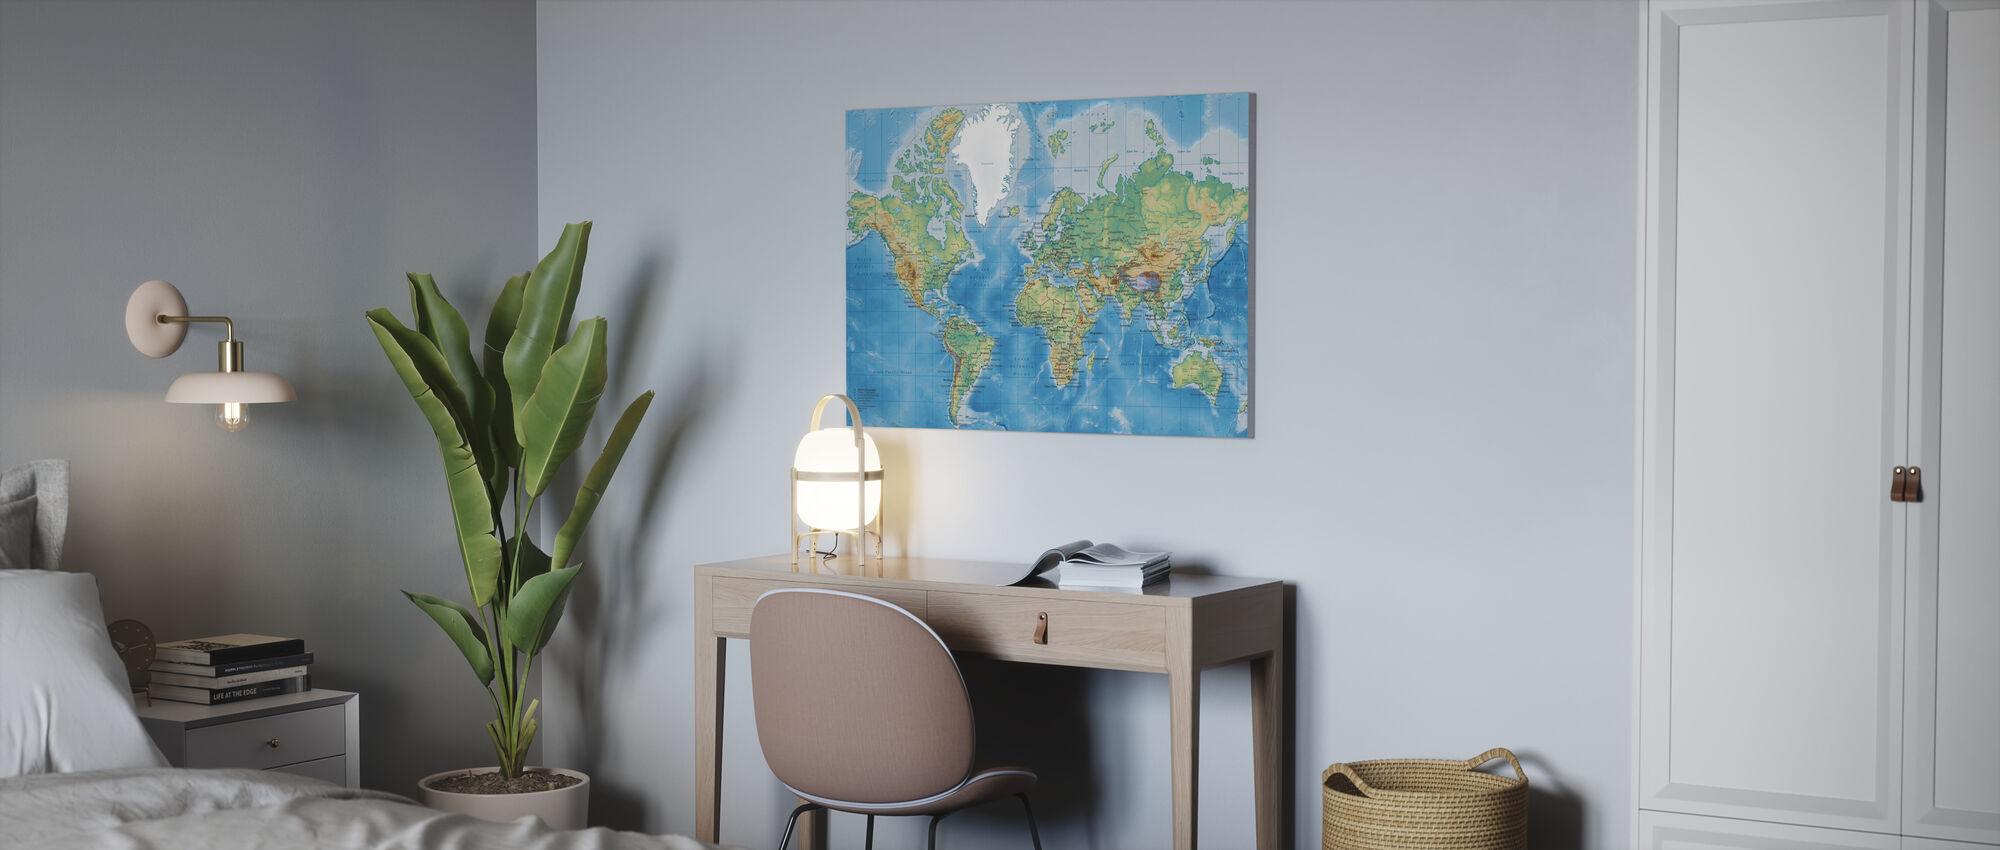 Weltkarte detailliert - Leinwandbild - Büro